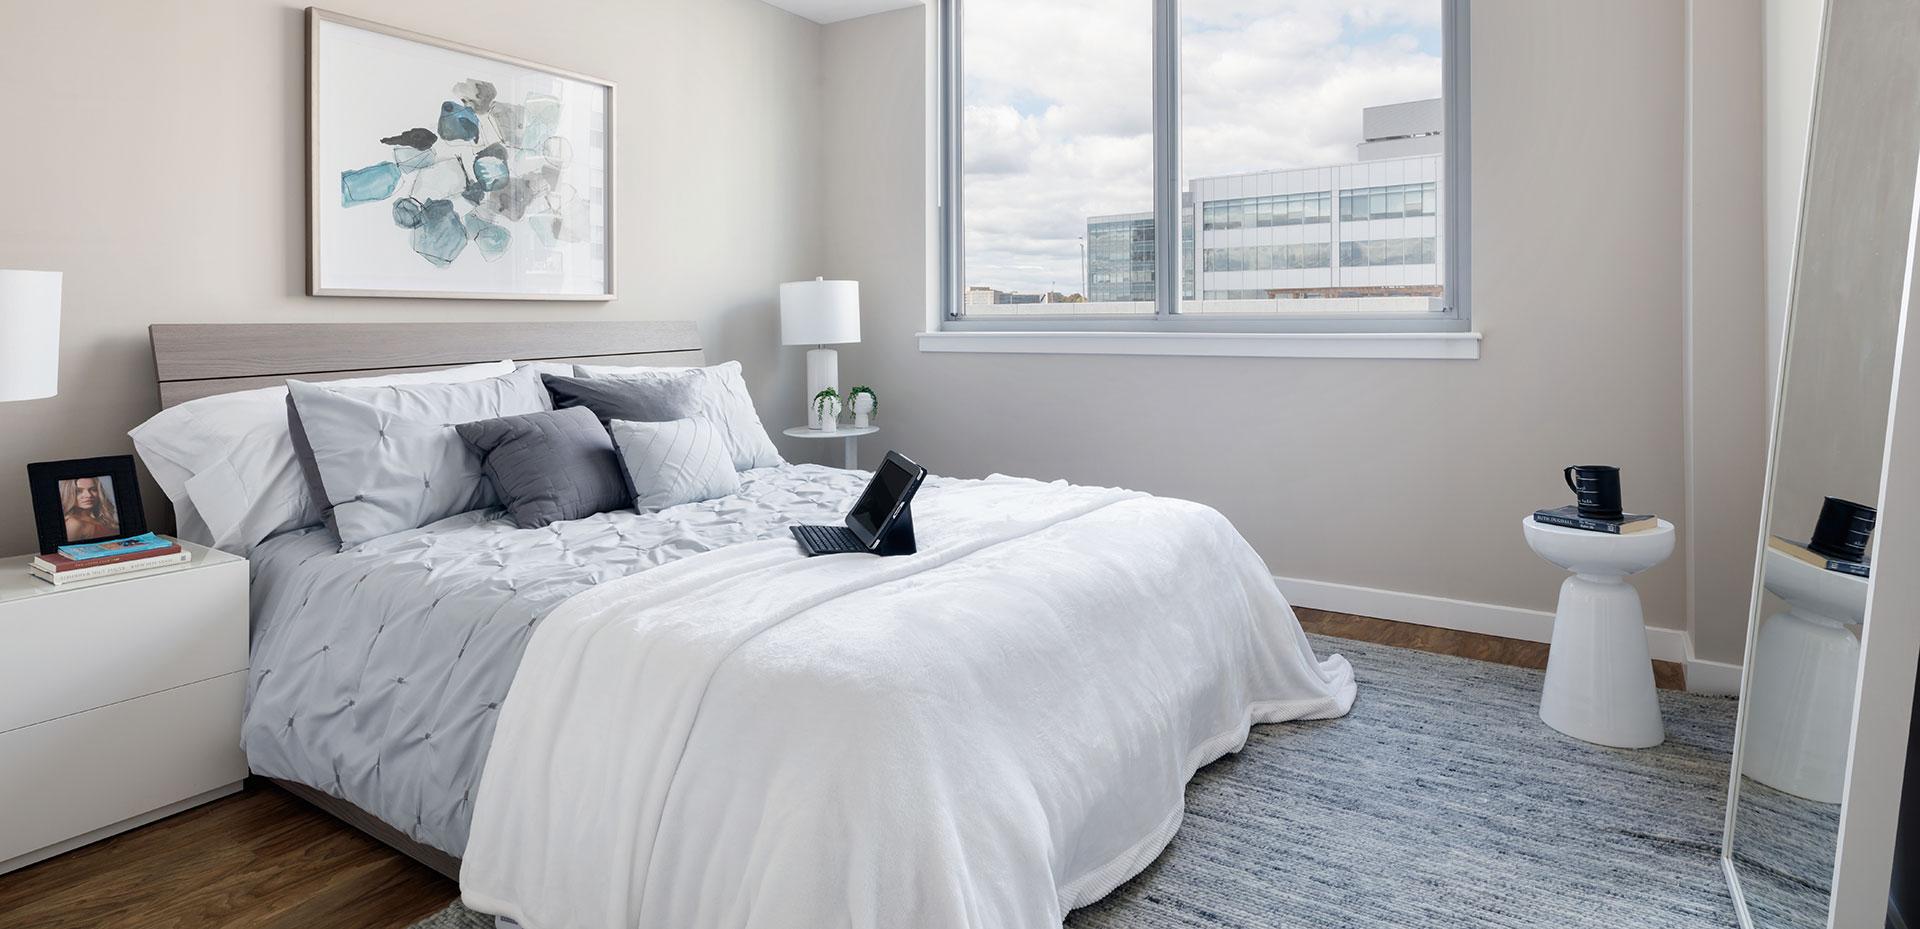 modern luxury apartment stamford bedroom with hardwood nv harbor point blt